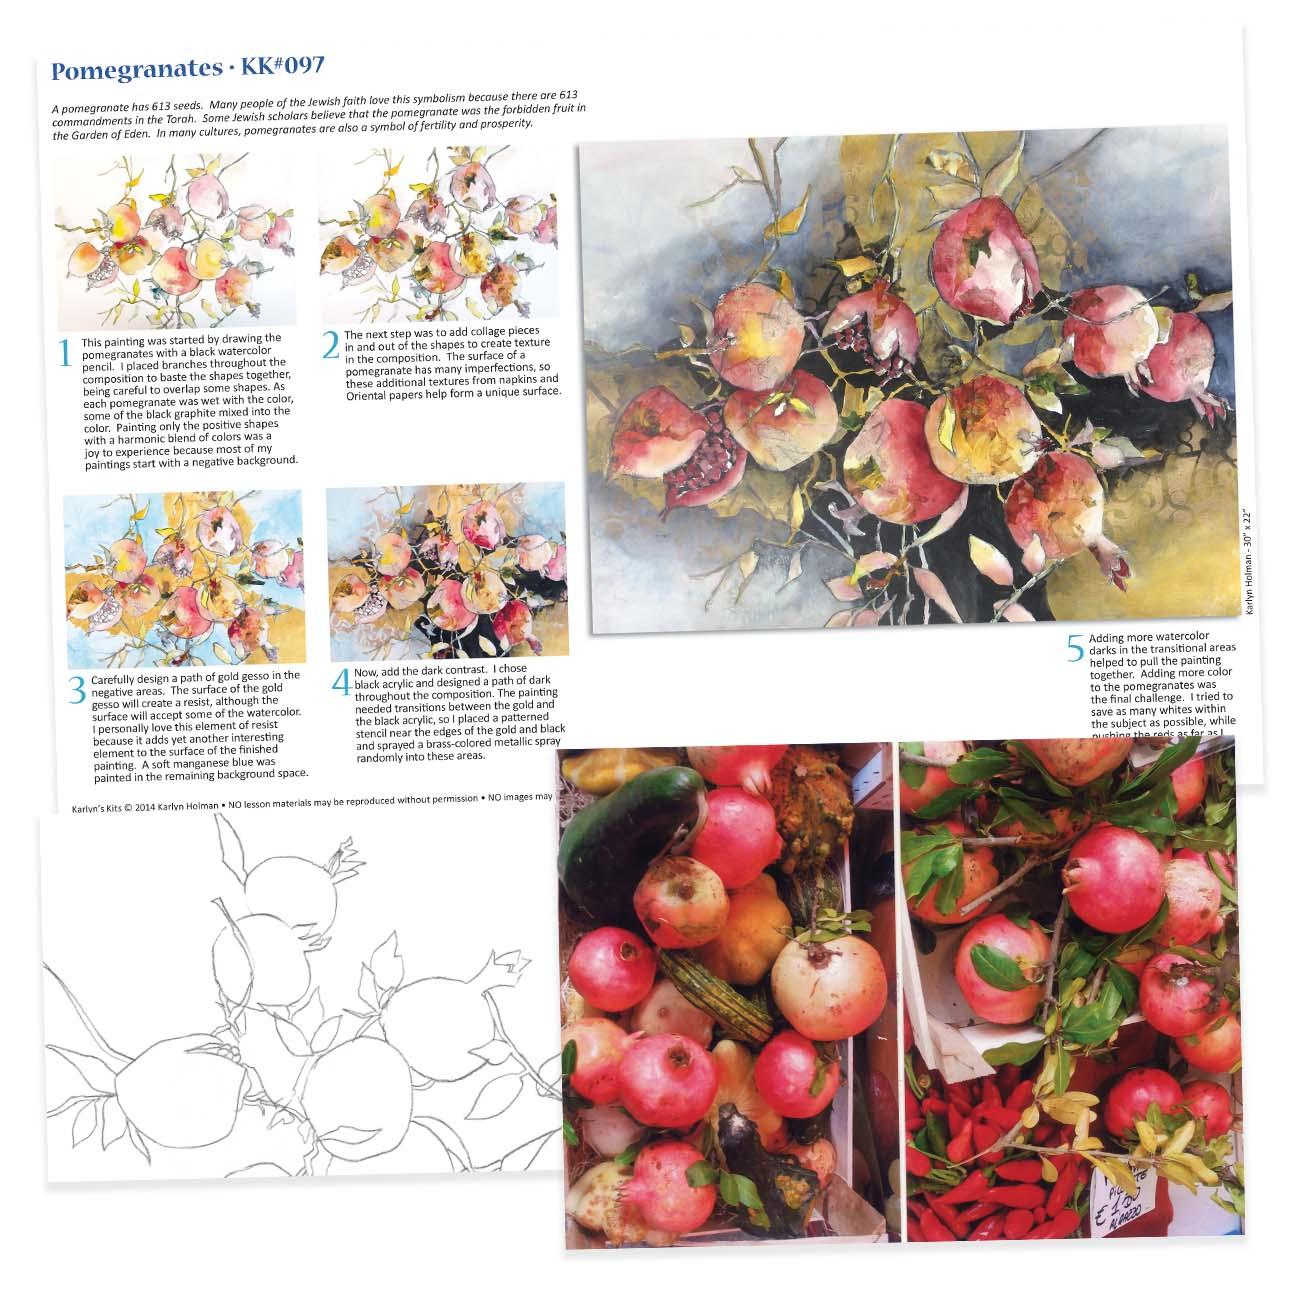 KK097 - Pomegranates